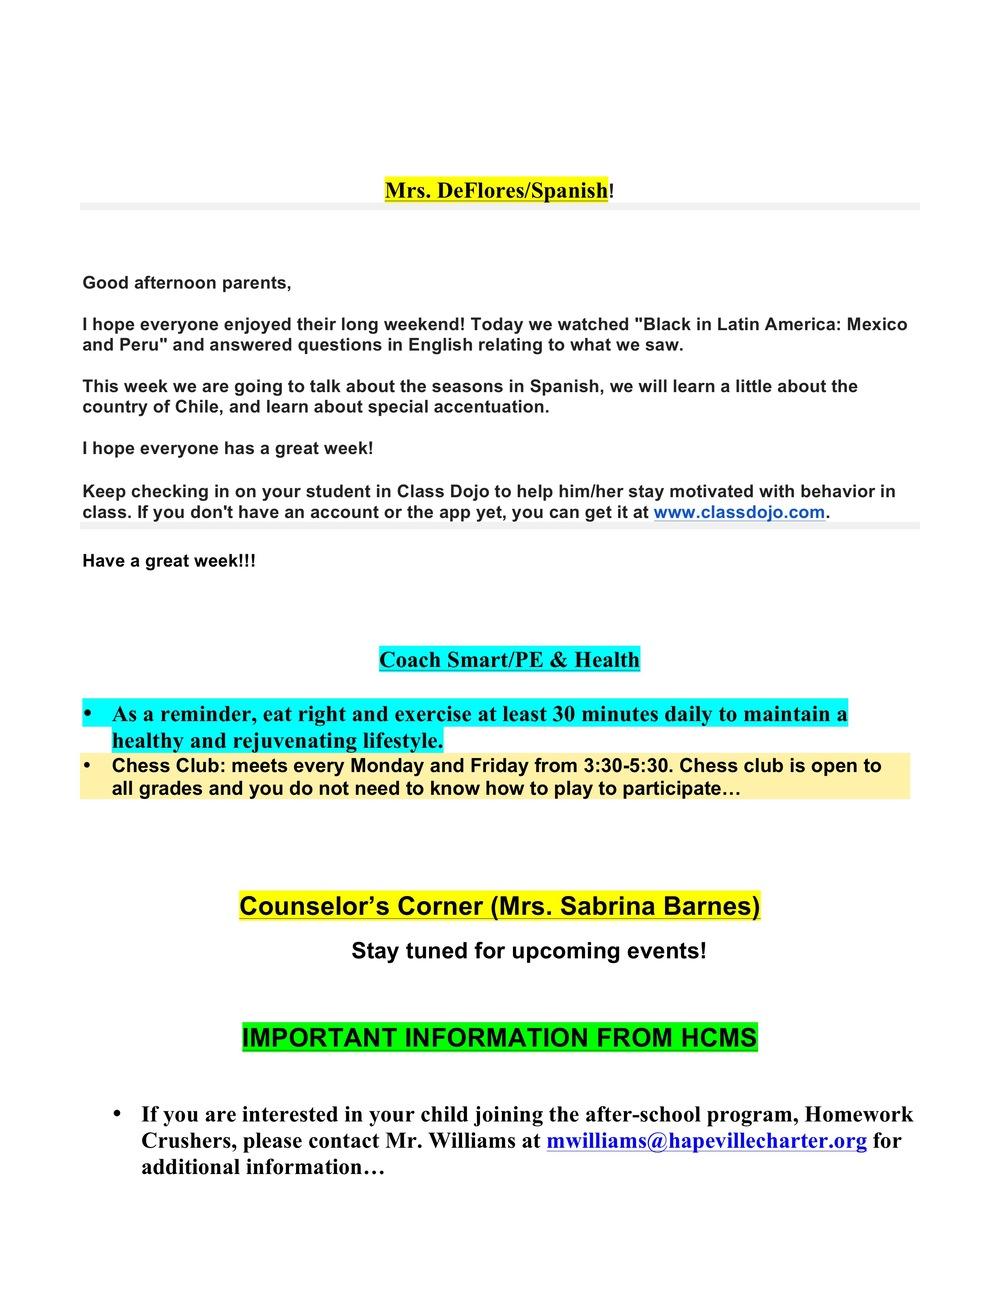 Newsletter Image7th feb 23 5.jpeg